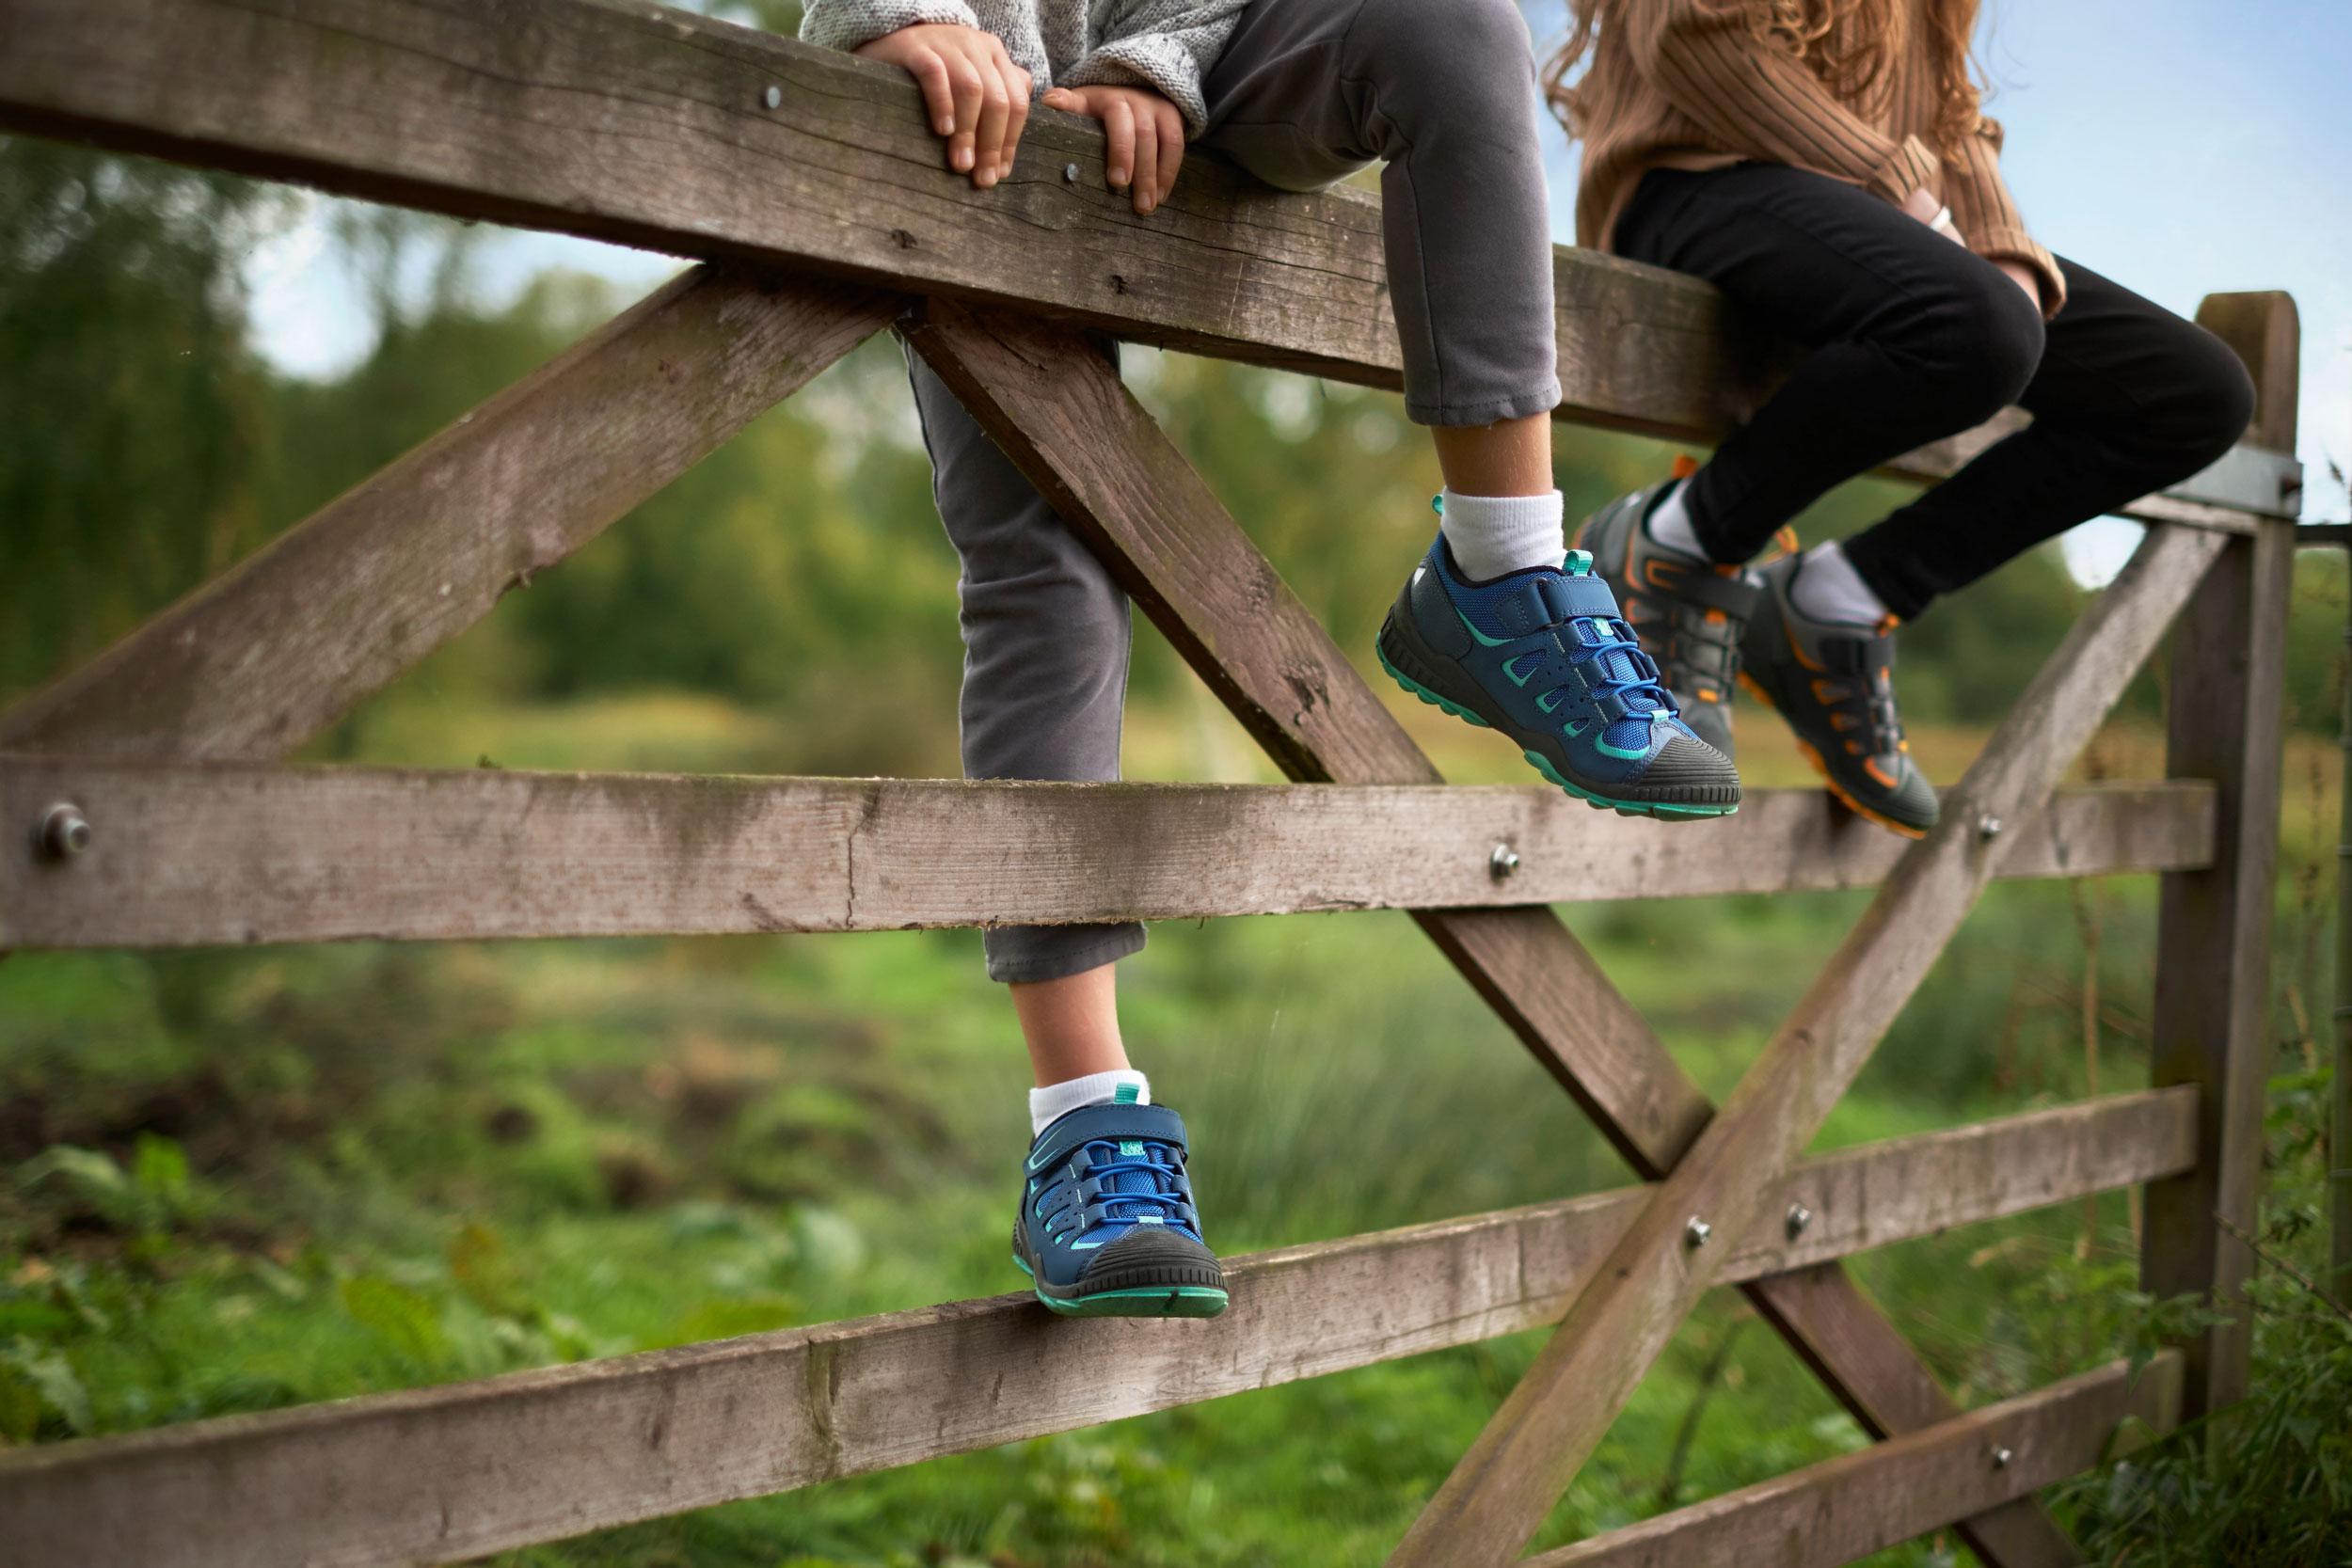 Start-rite-shoes-Fiona-Burrage-norwich-photographer-fence.jpg